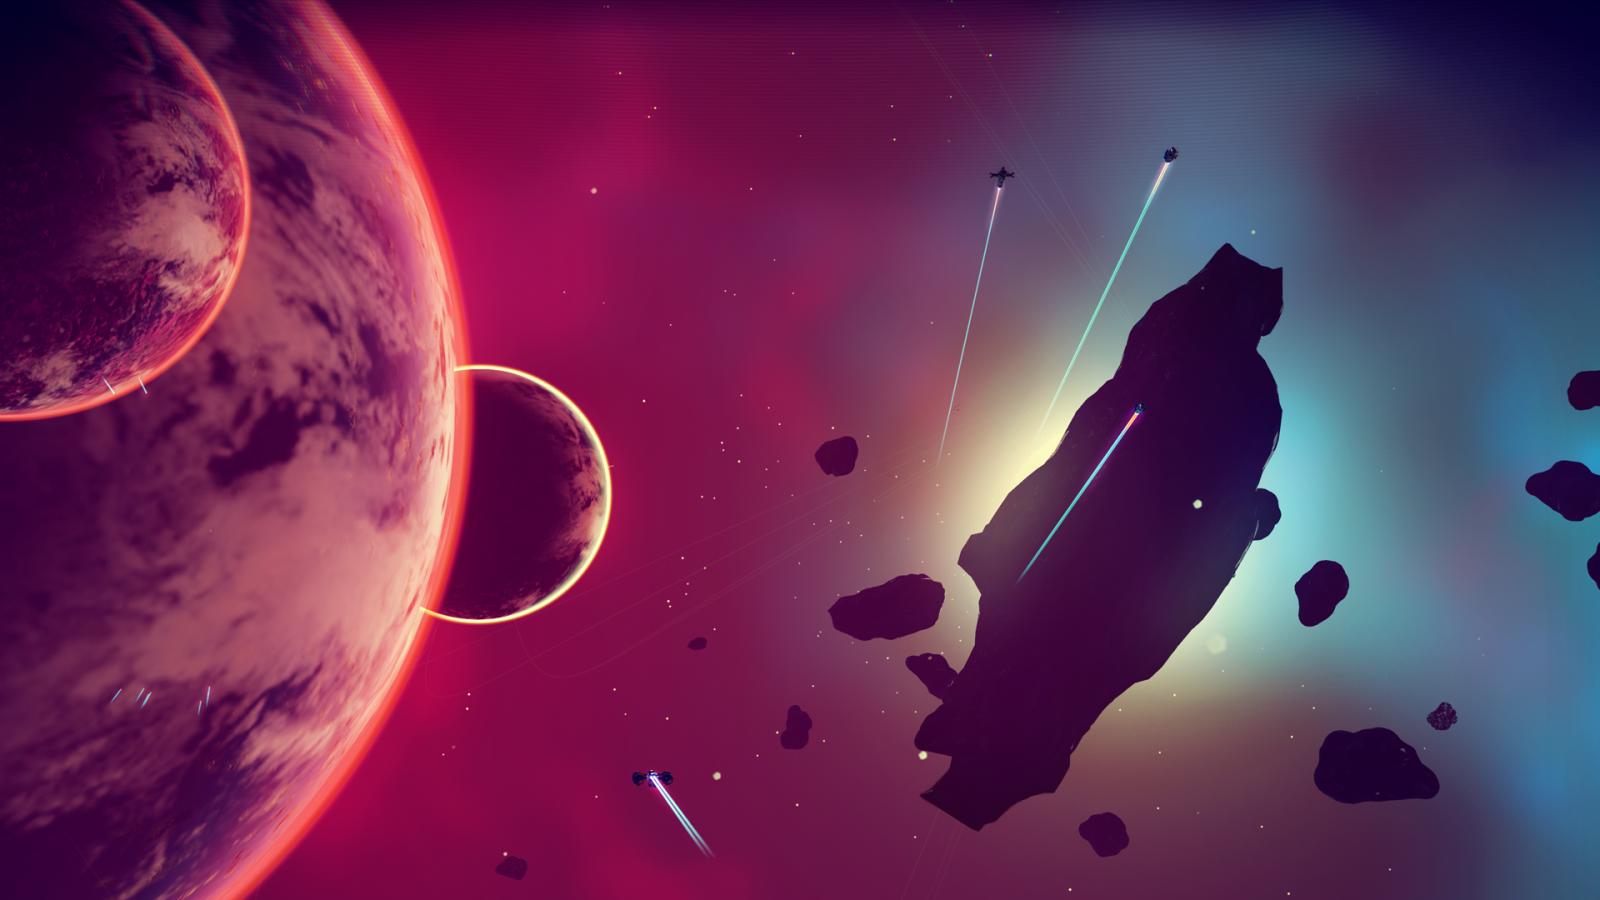 No Man\'s Sky screenshot space